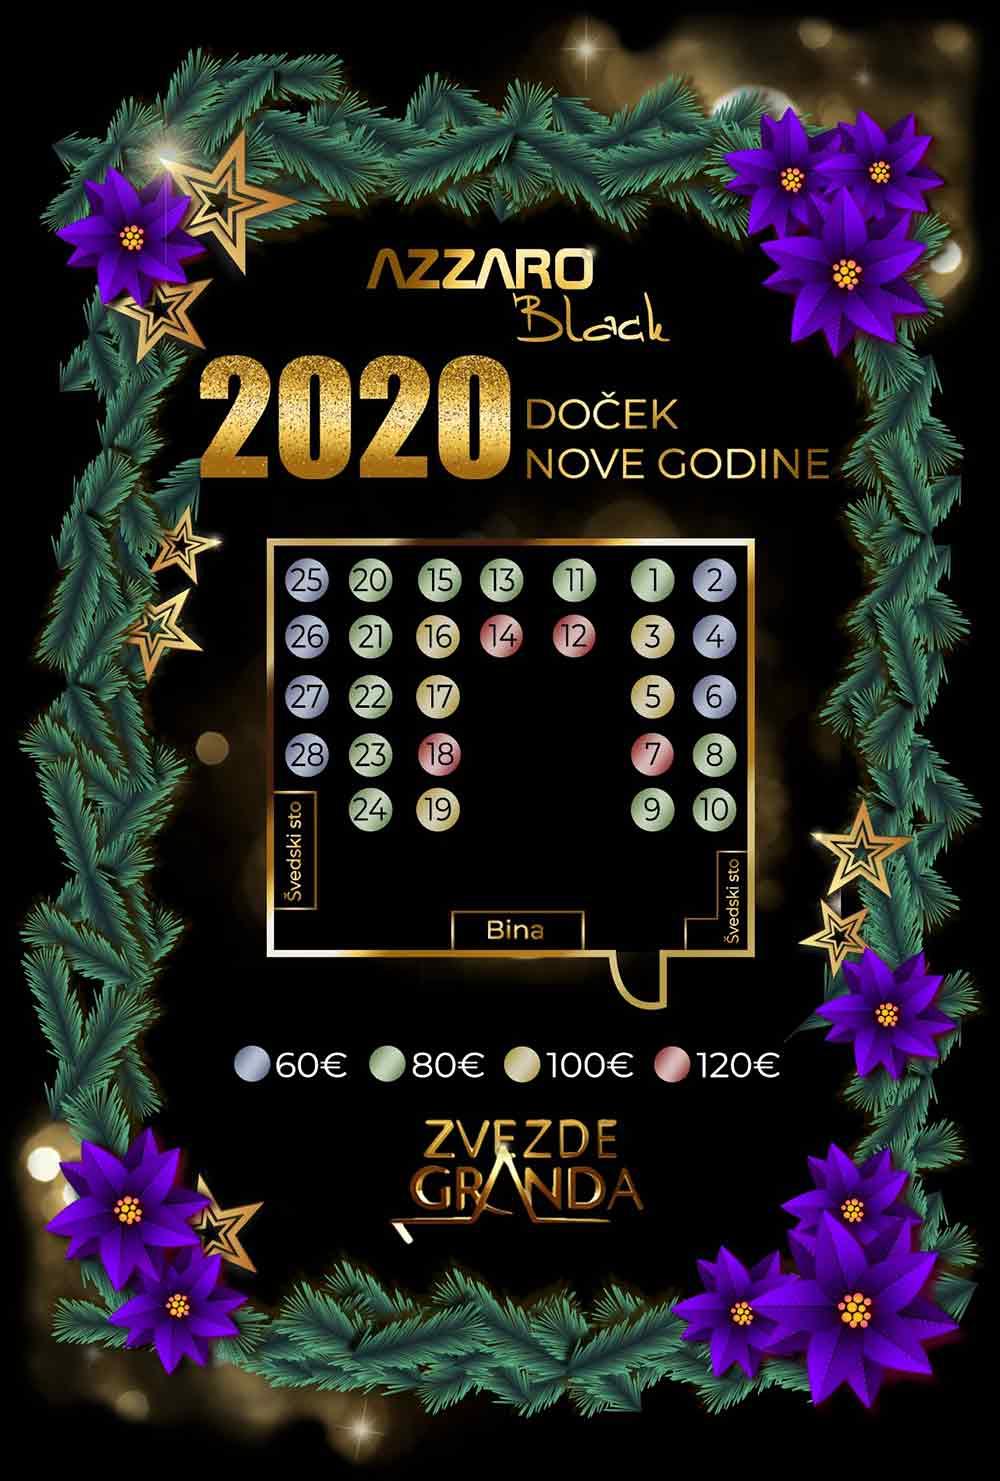 klub azzaro nova godina mapa sedenja 1